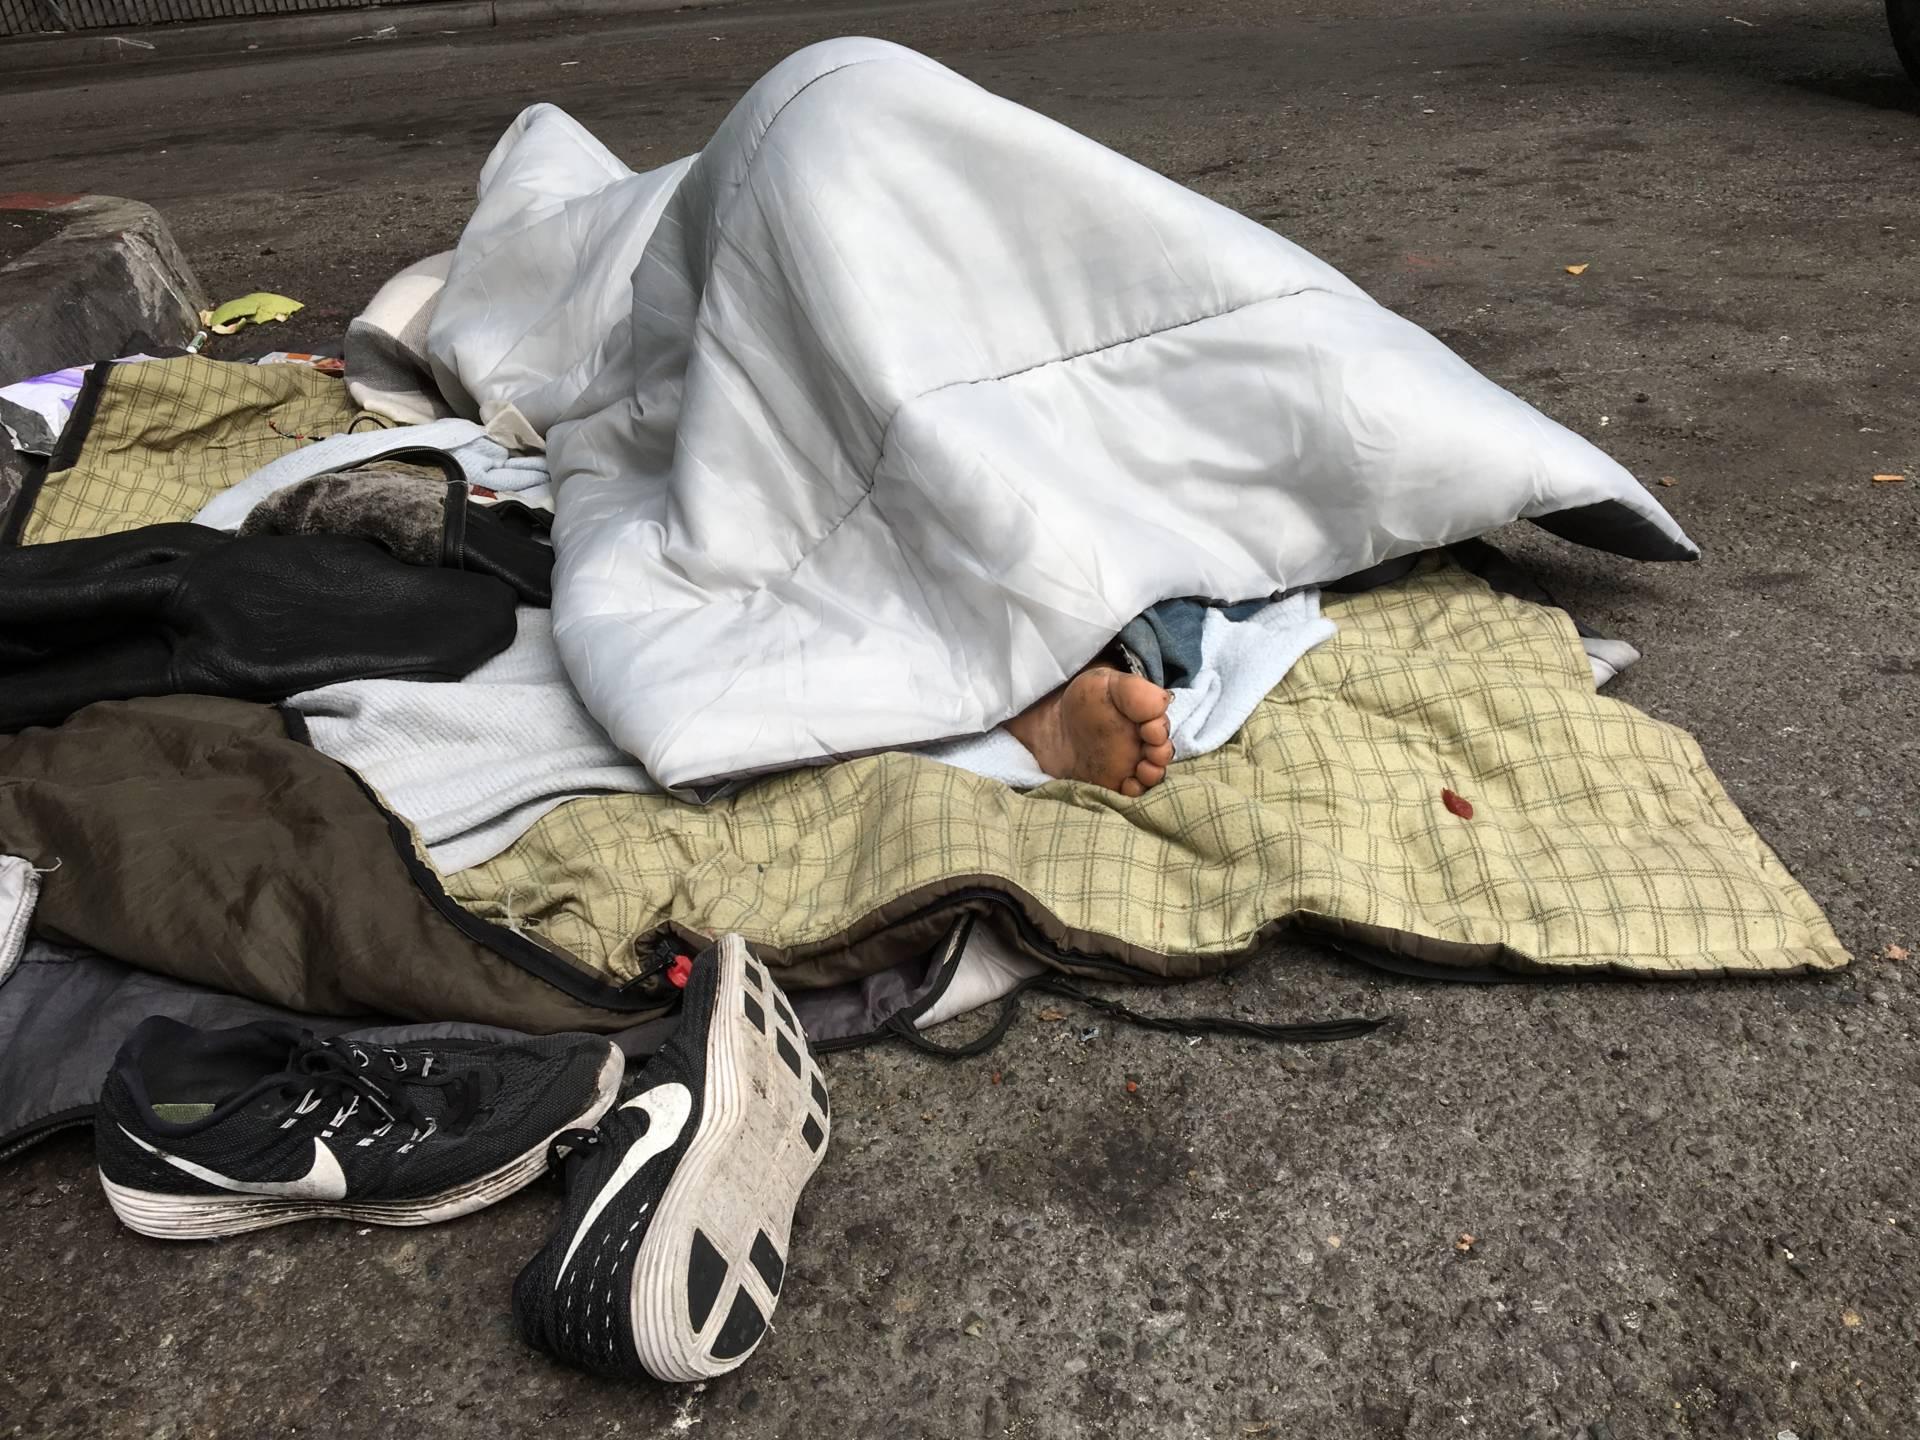 San Francisco Nonprofit Pledges $100 Million to Battle Homelessness